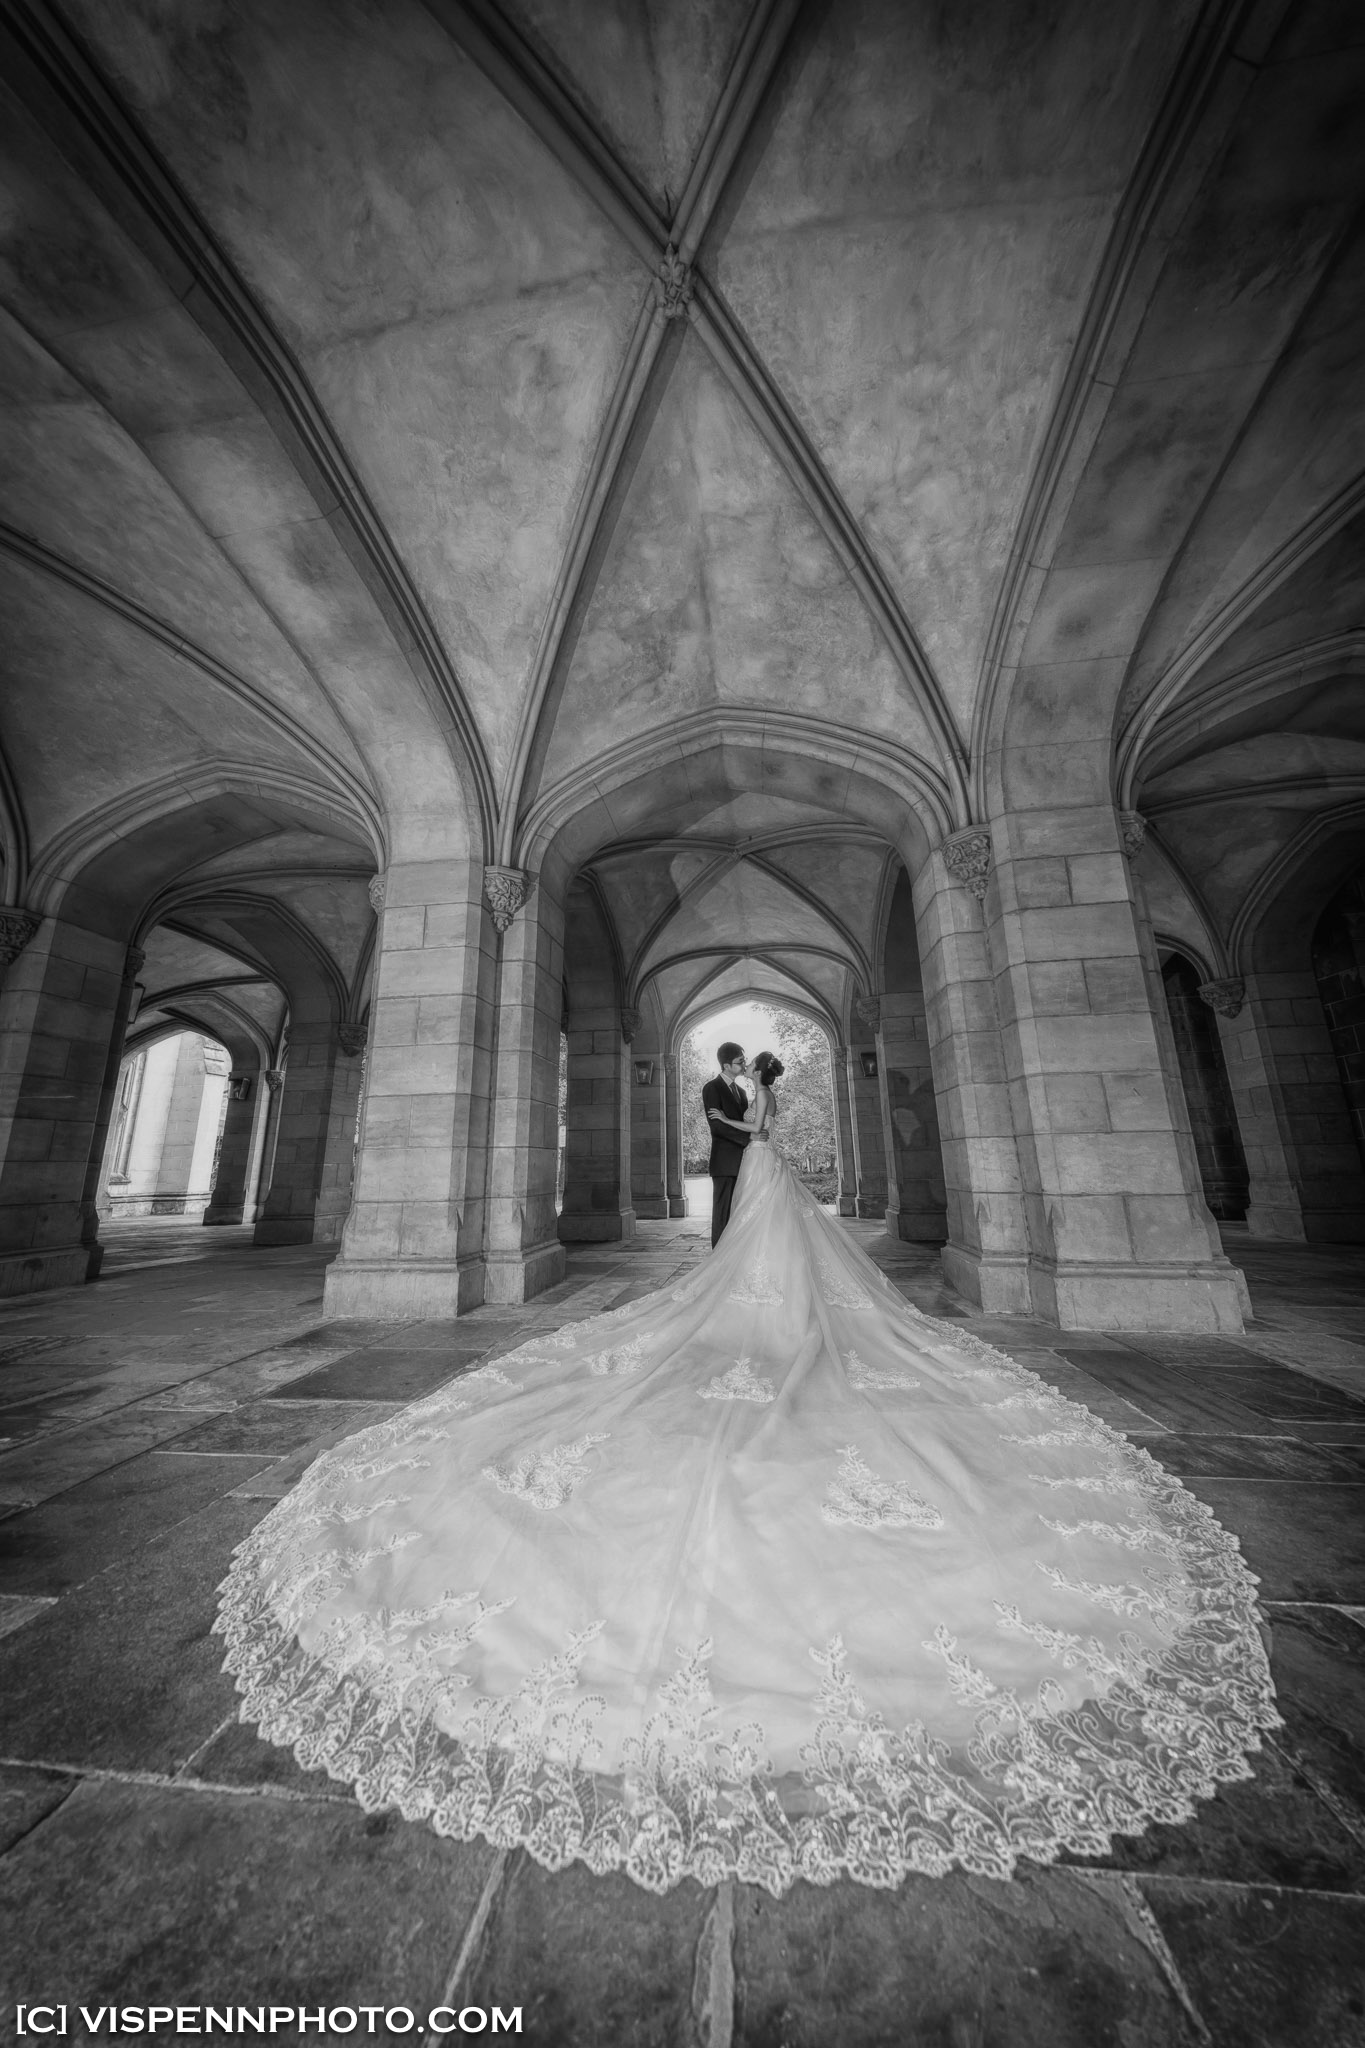 PRE WEDDING Photography Melbourne VISPENN 墨尔本 婚纱照 结婚照 婚纱摄影 VISPENN SophieXing 2492 Edit